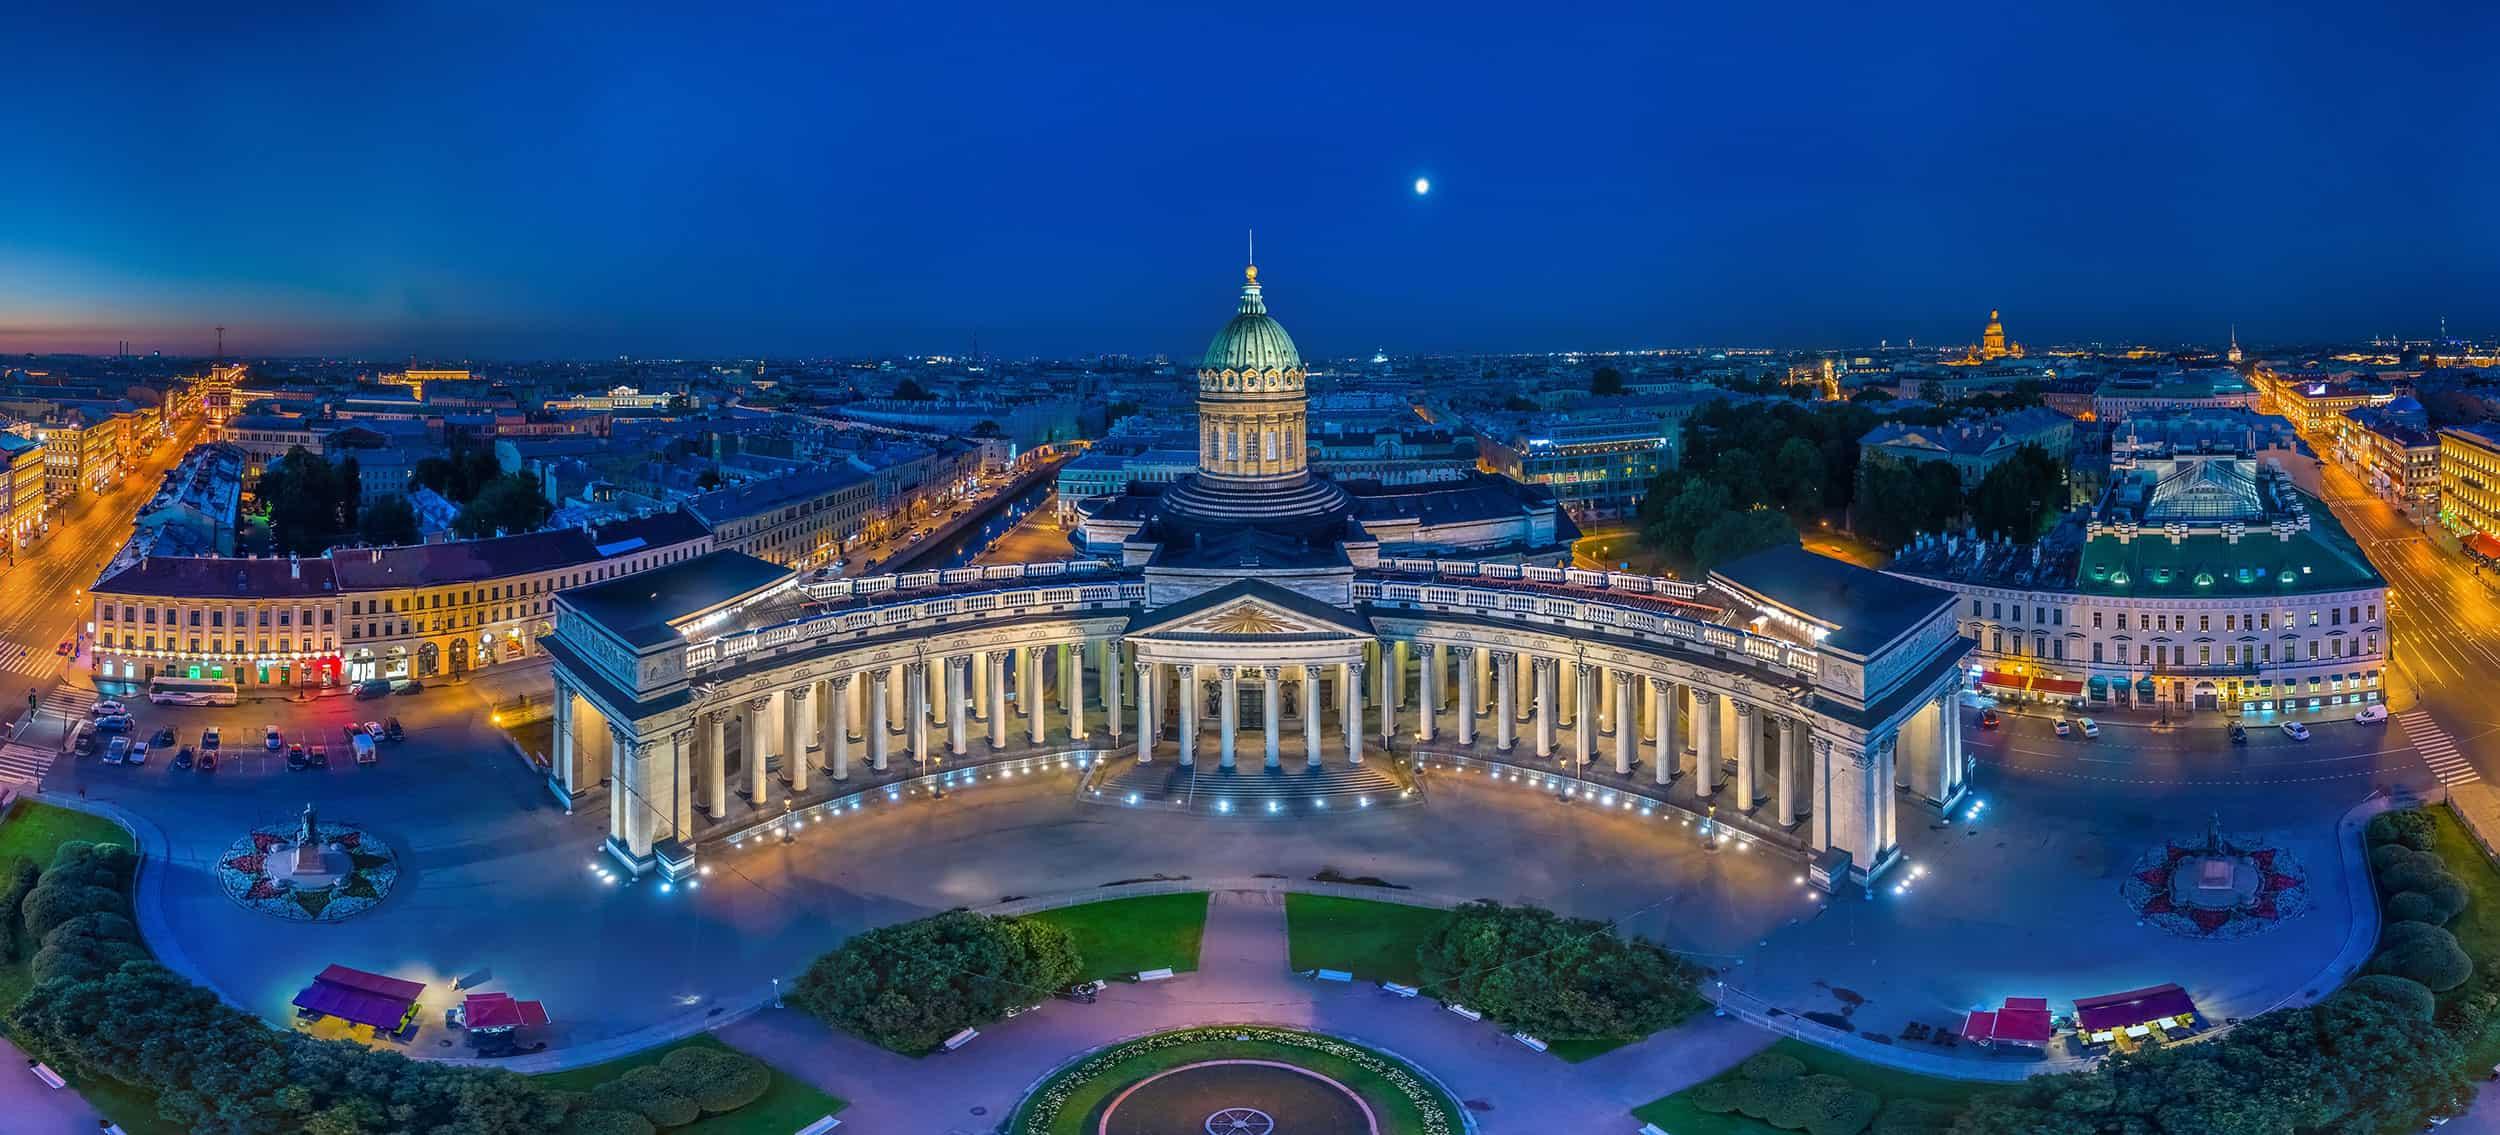 Peterburg Peter Katedrala Kazan Nevski prospekt